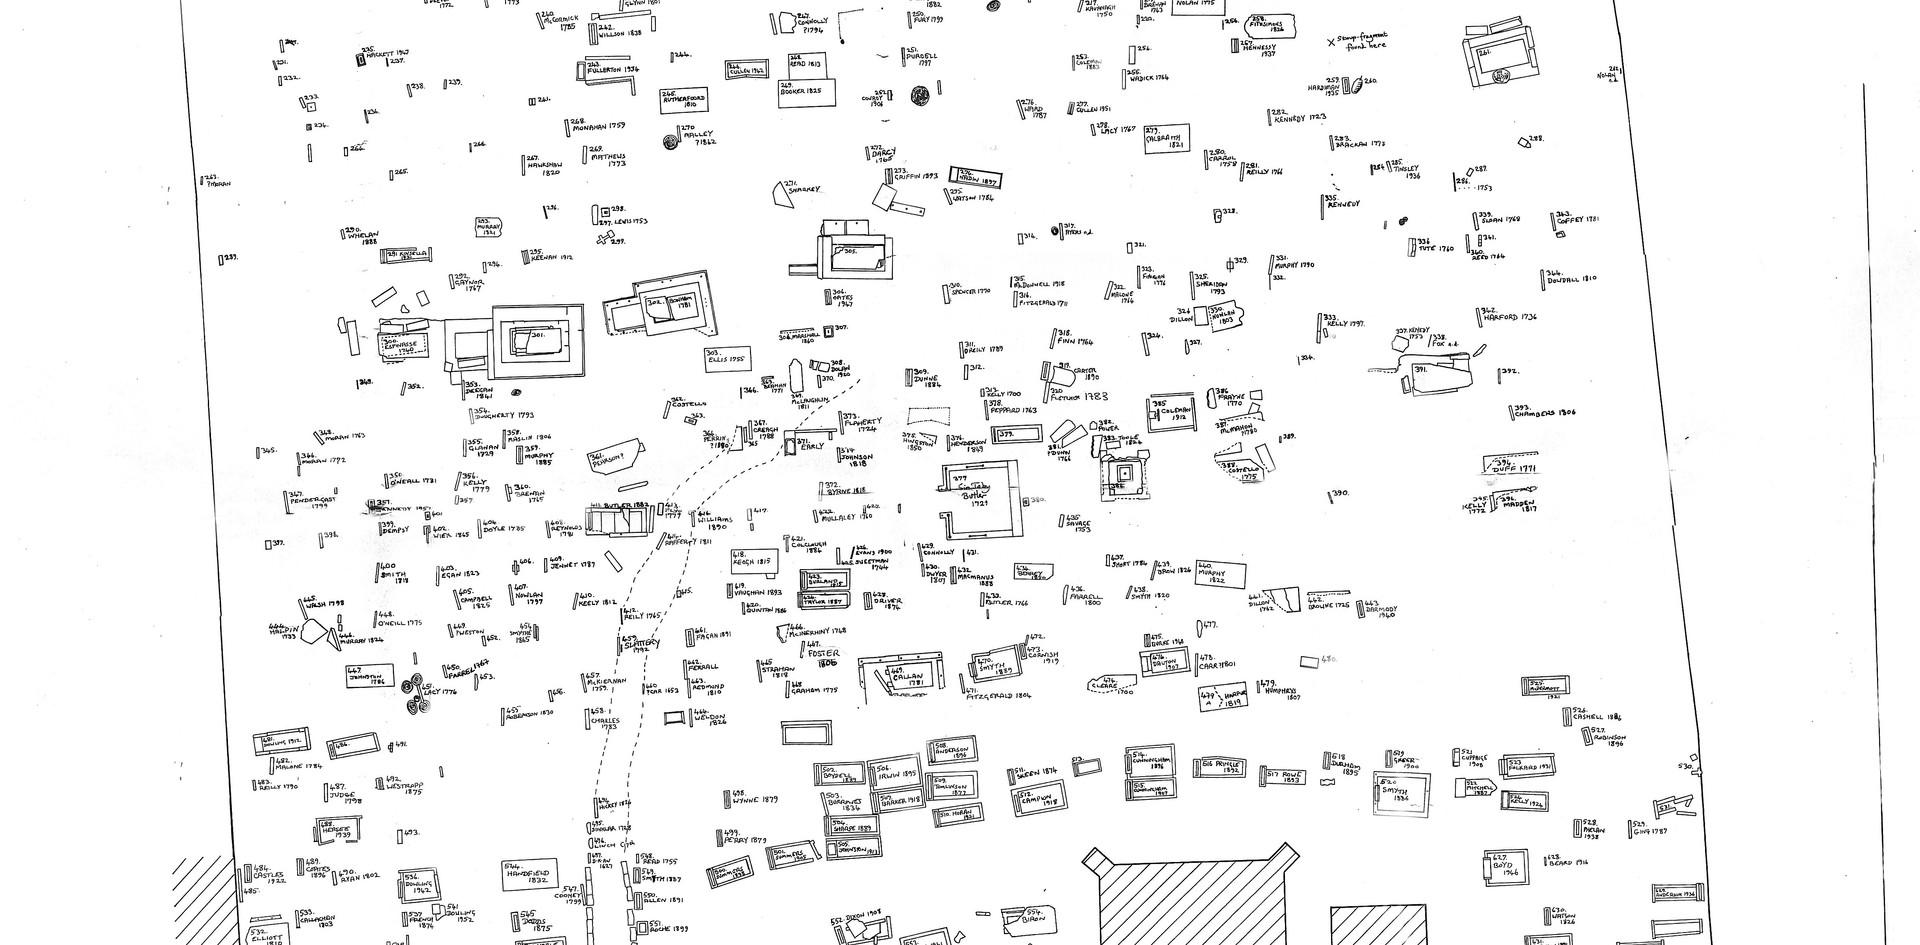 St James's Graveyard - Gravestone Mapping